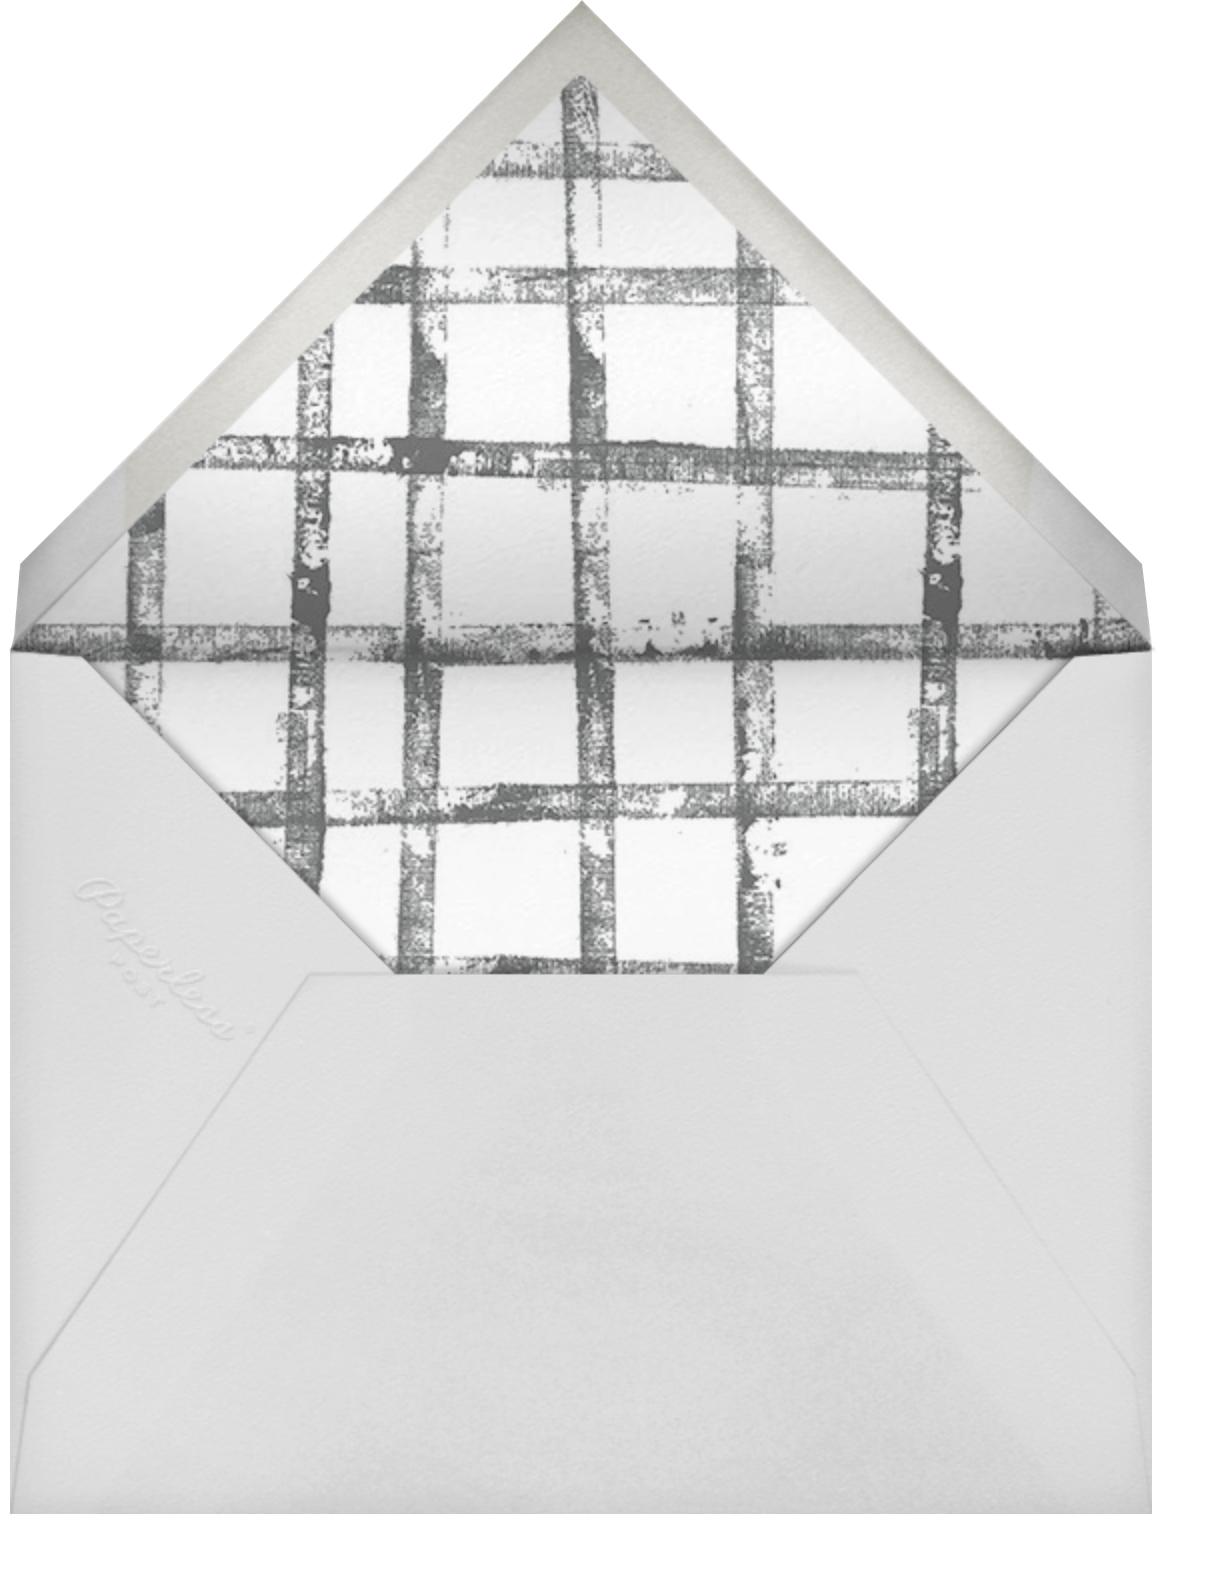 Muse (Invitation) - Kelly Wearstler - All - envelope back